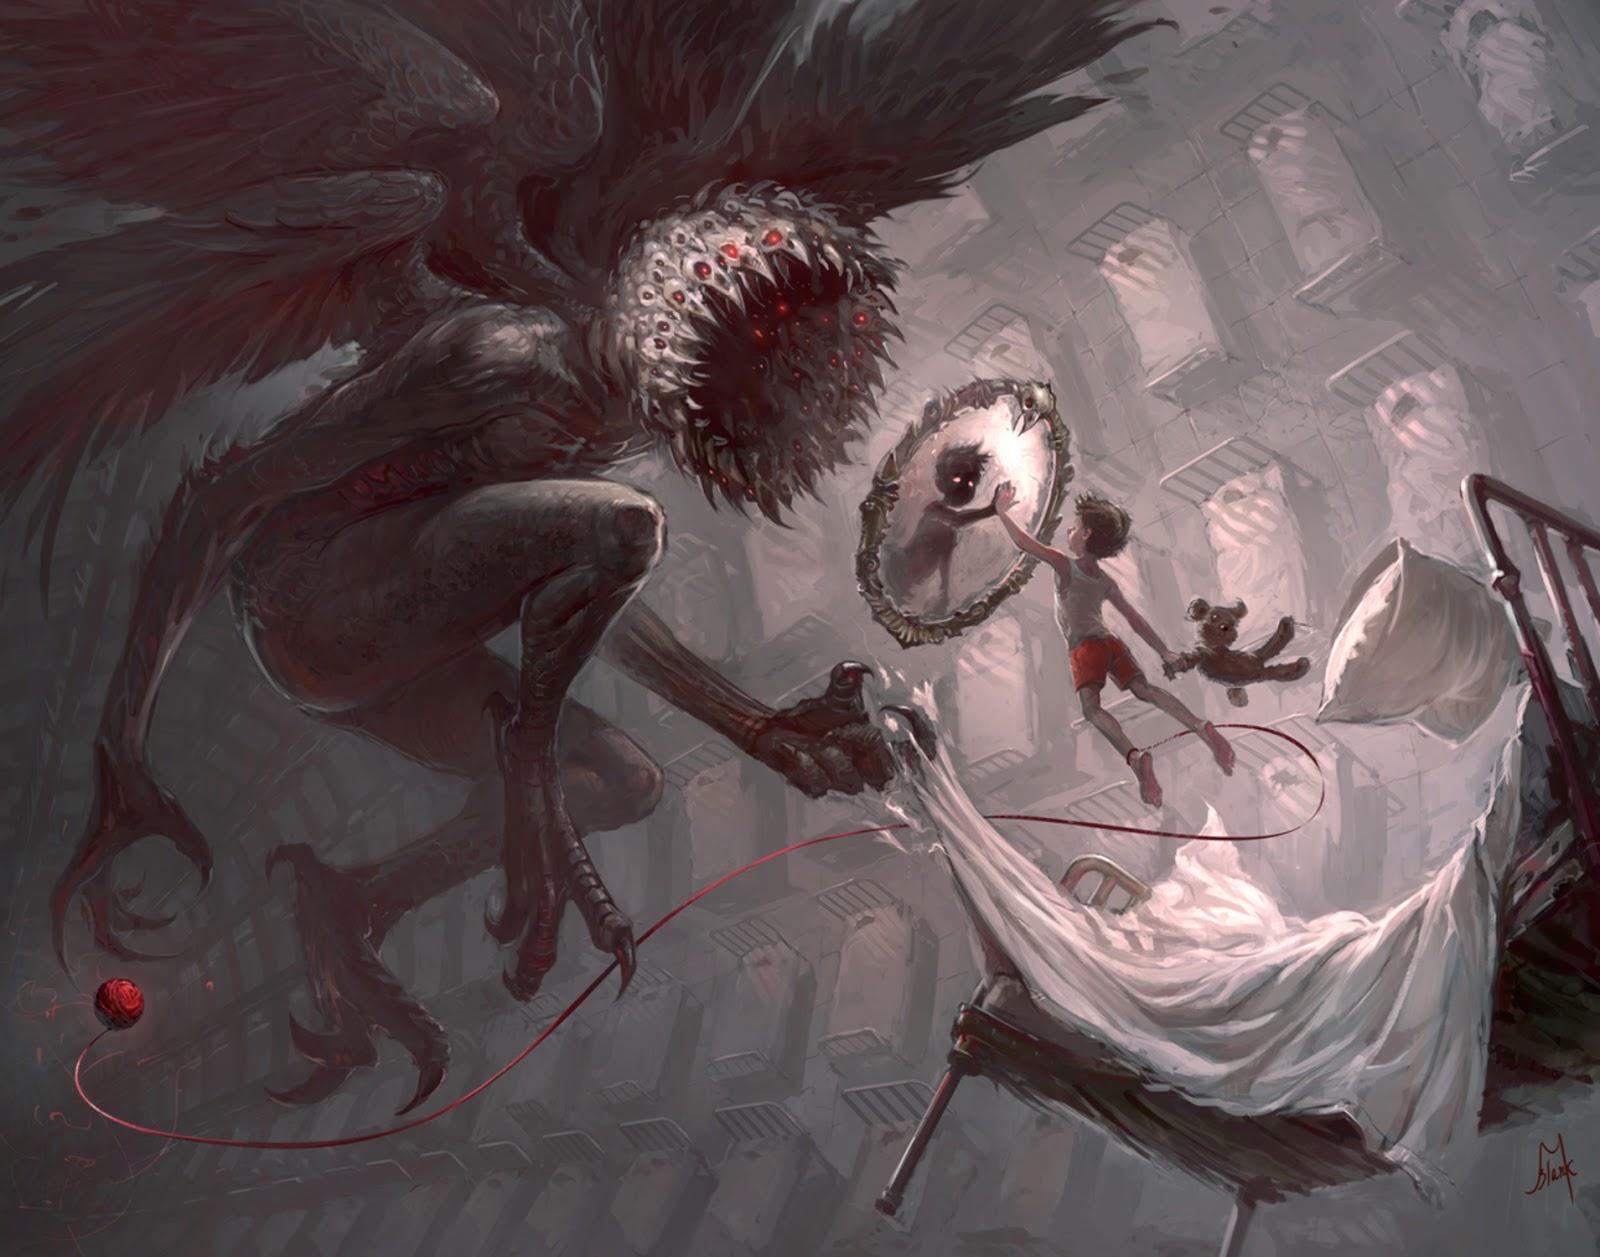 f41429e06 The Geeky Nerfherder: #CoolArt: Infected By Art 7 Award Winners